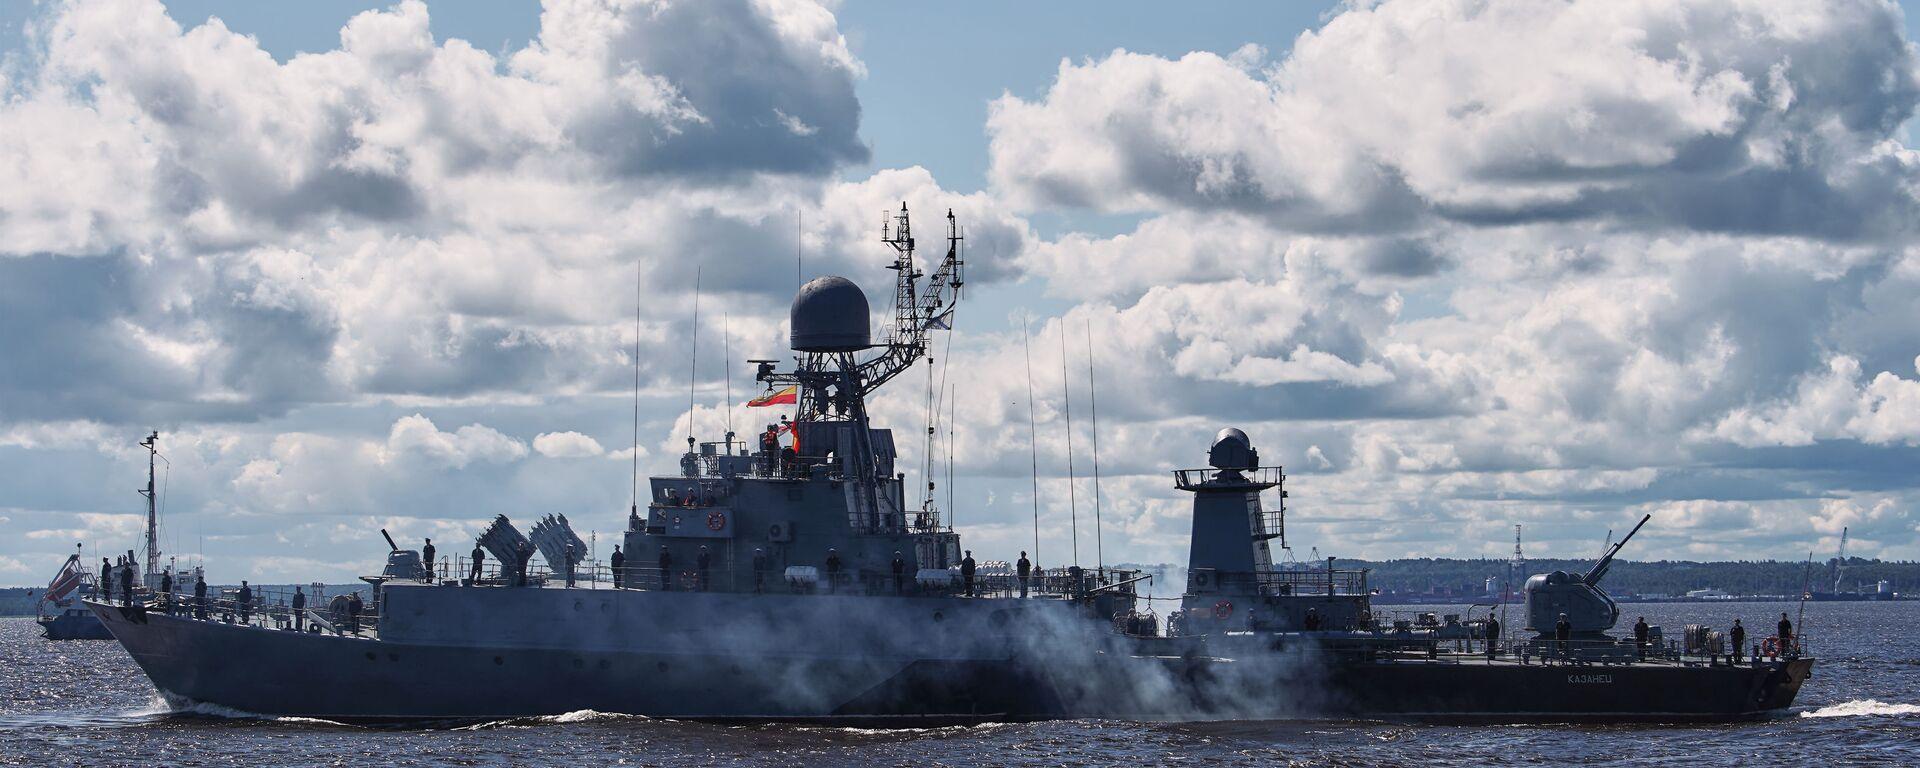 Репетиция парада в честь Дня Военно-морского флота - Sputnik Latvija, 1920, 21.05.2021